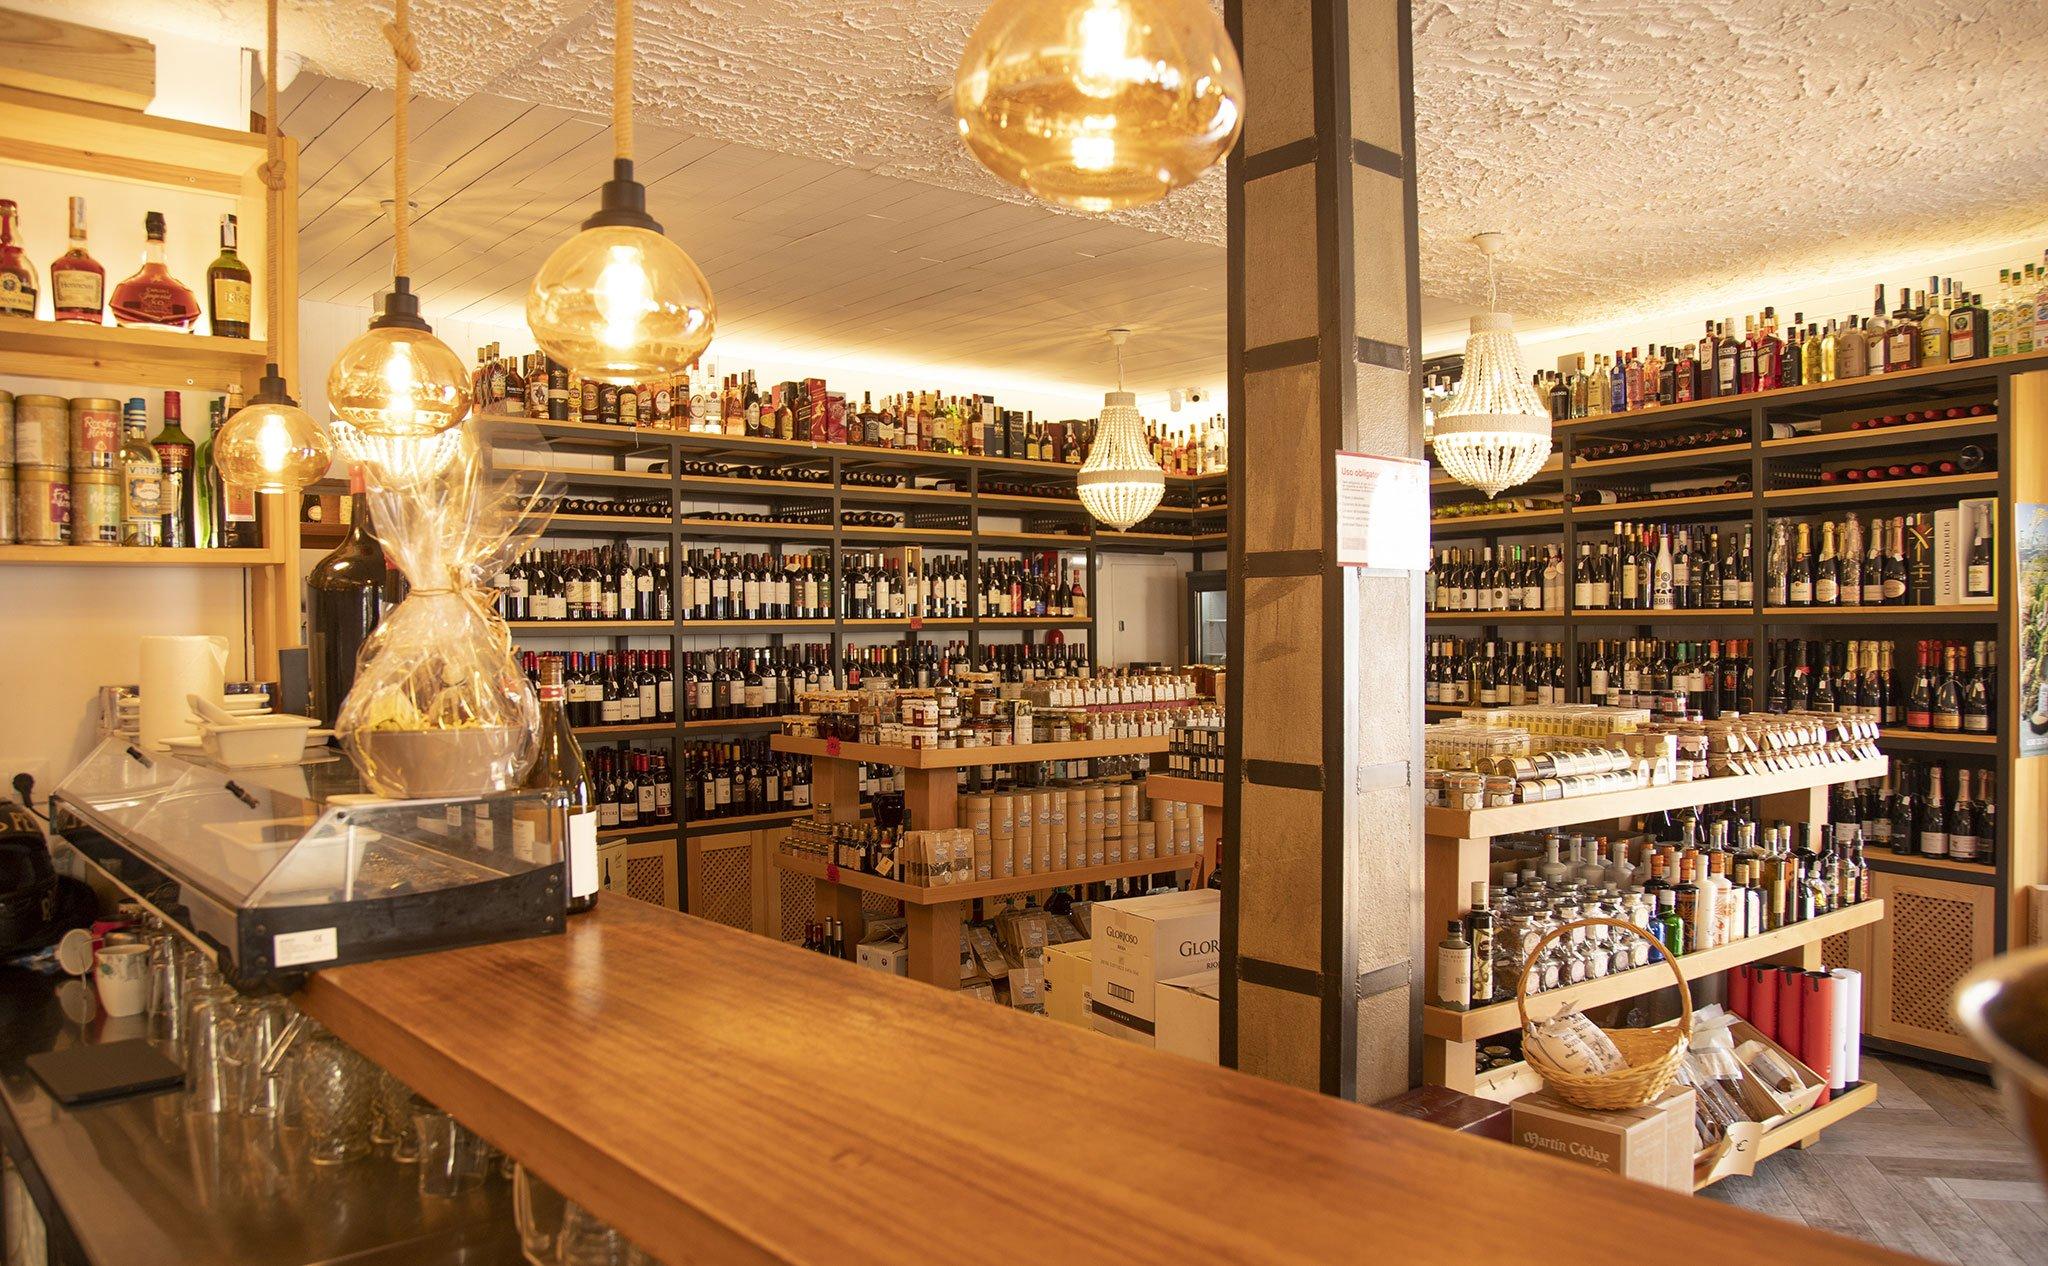 Interior de una bodega en Jávea, El Celler de La Fontana – Restaurante La Fontana